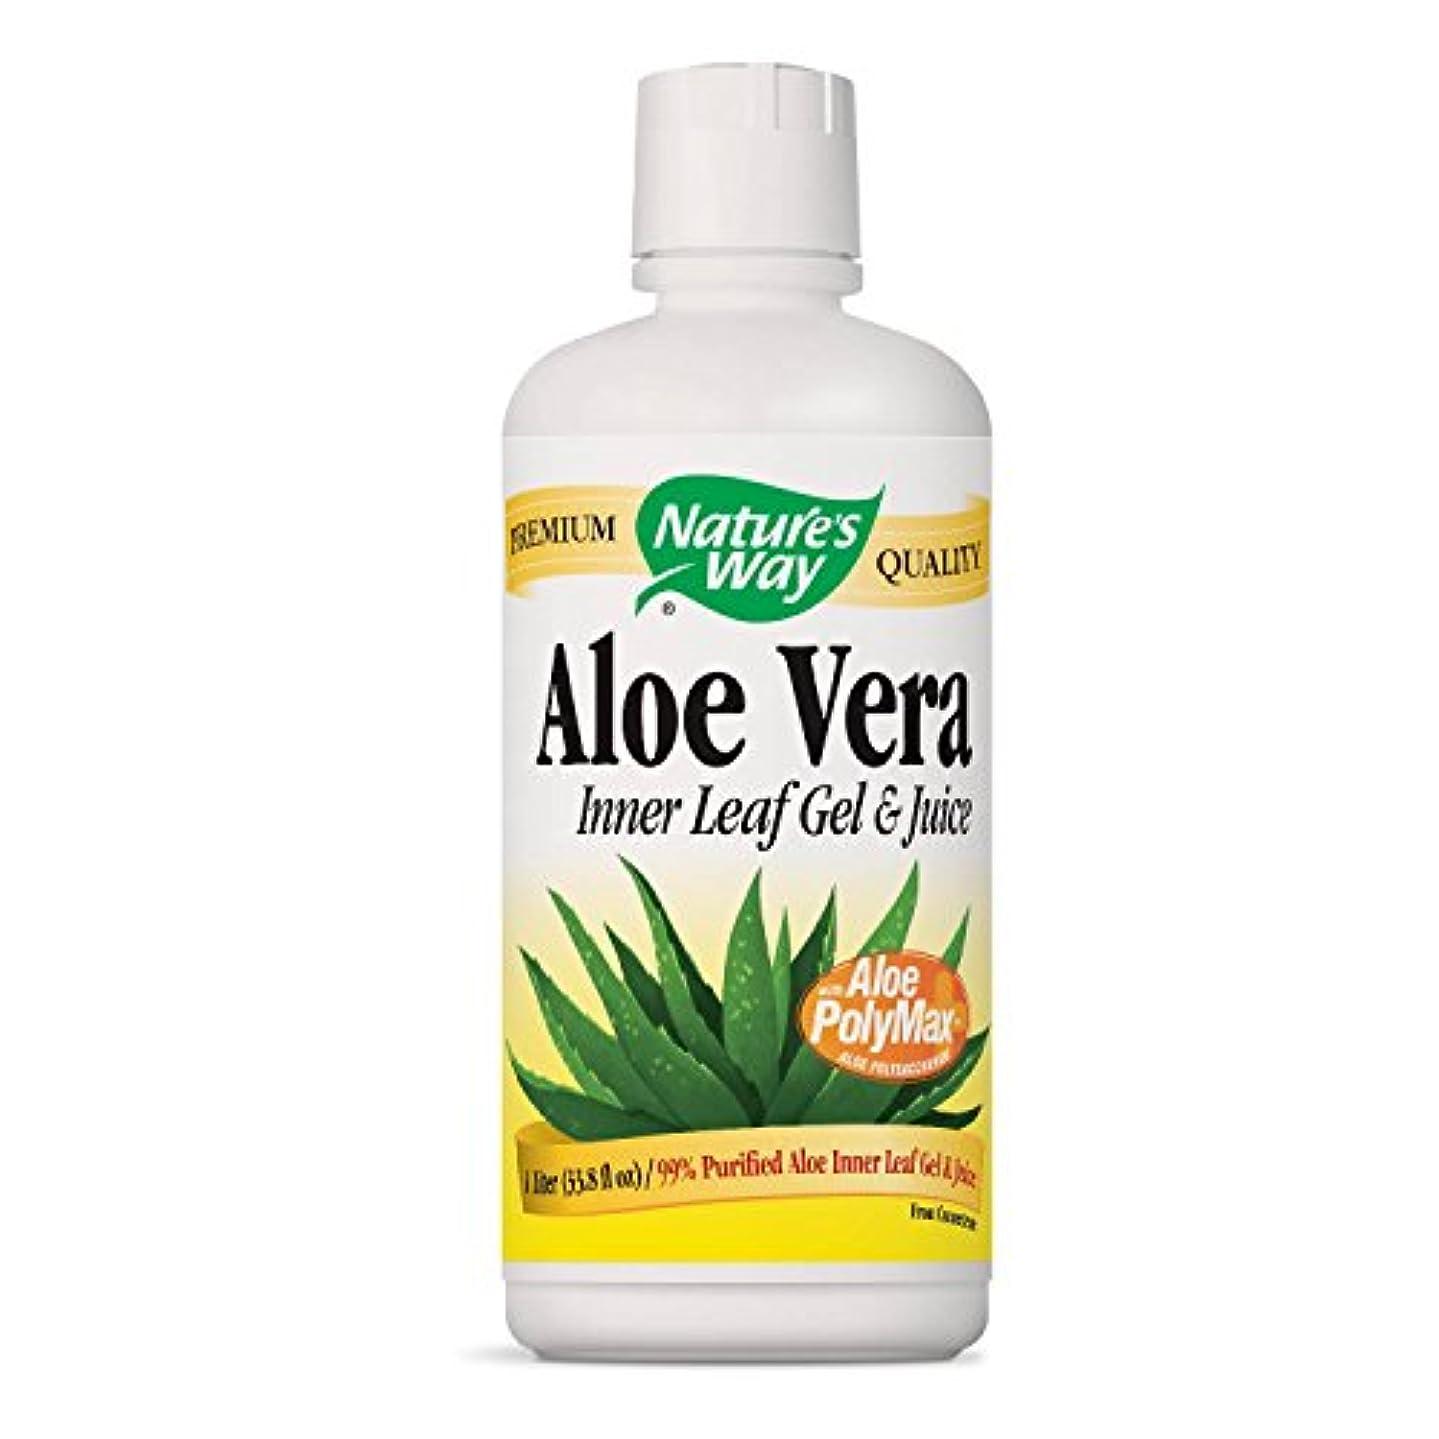 叙情的な機密療法Aloe Vera Leaf Gel & Juice 1L (海外直送品)